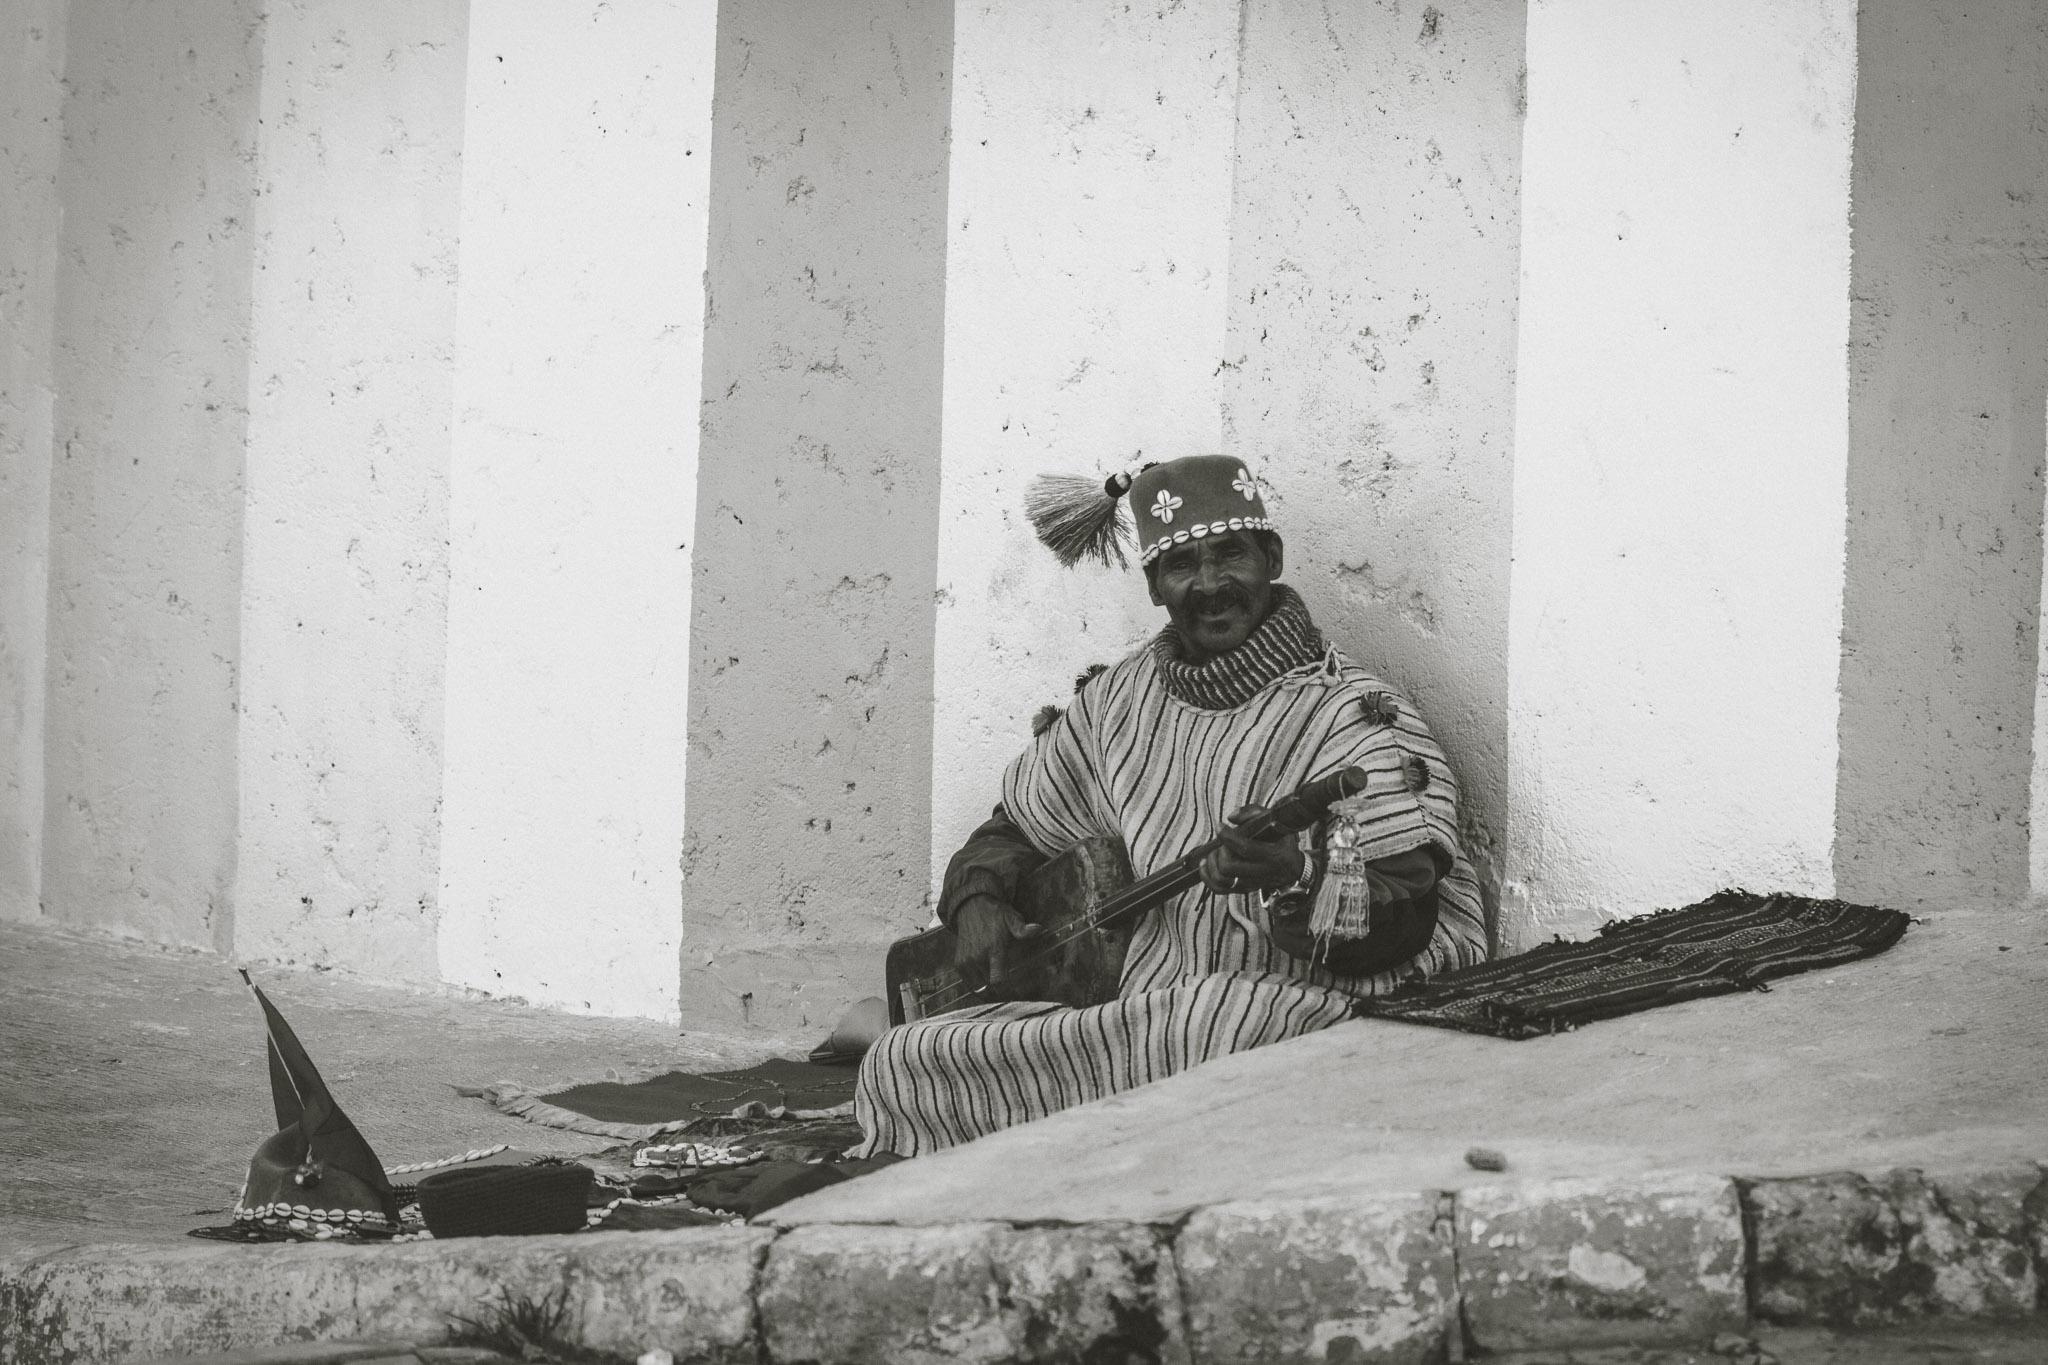 morocco_rabat_fez_casablanca_lesleyade_photography-11.jpg